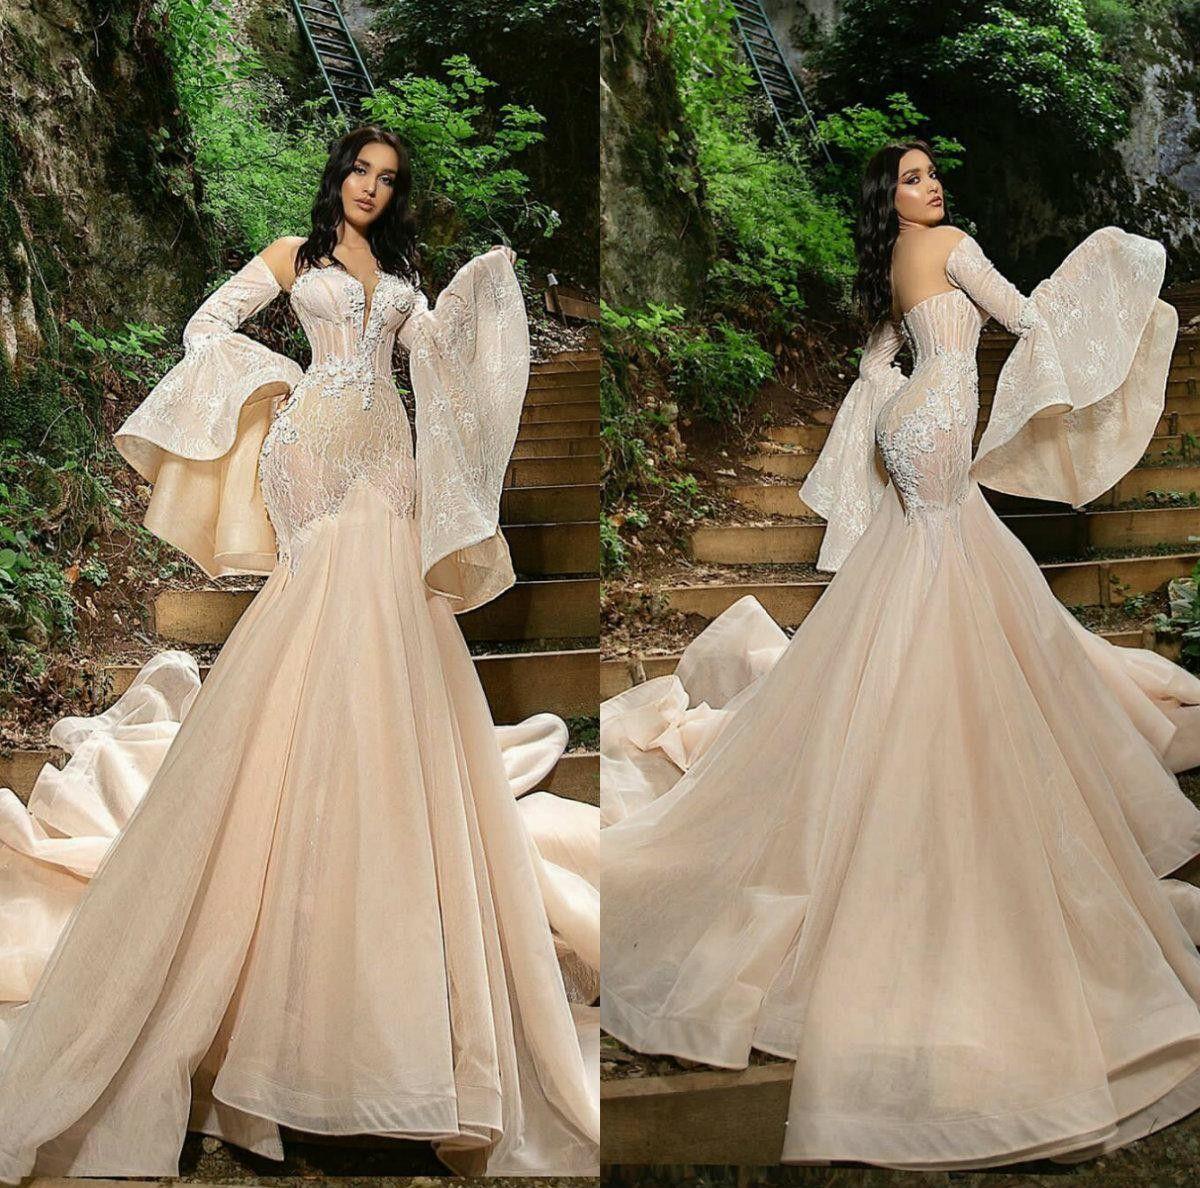 2021 Elegant Wedding Dresses V Neck Long Sleeves Mermaid Bridal Gowns Custom Made Lace Appliques Sweep Train